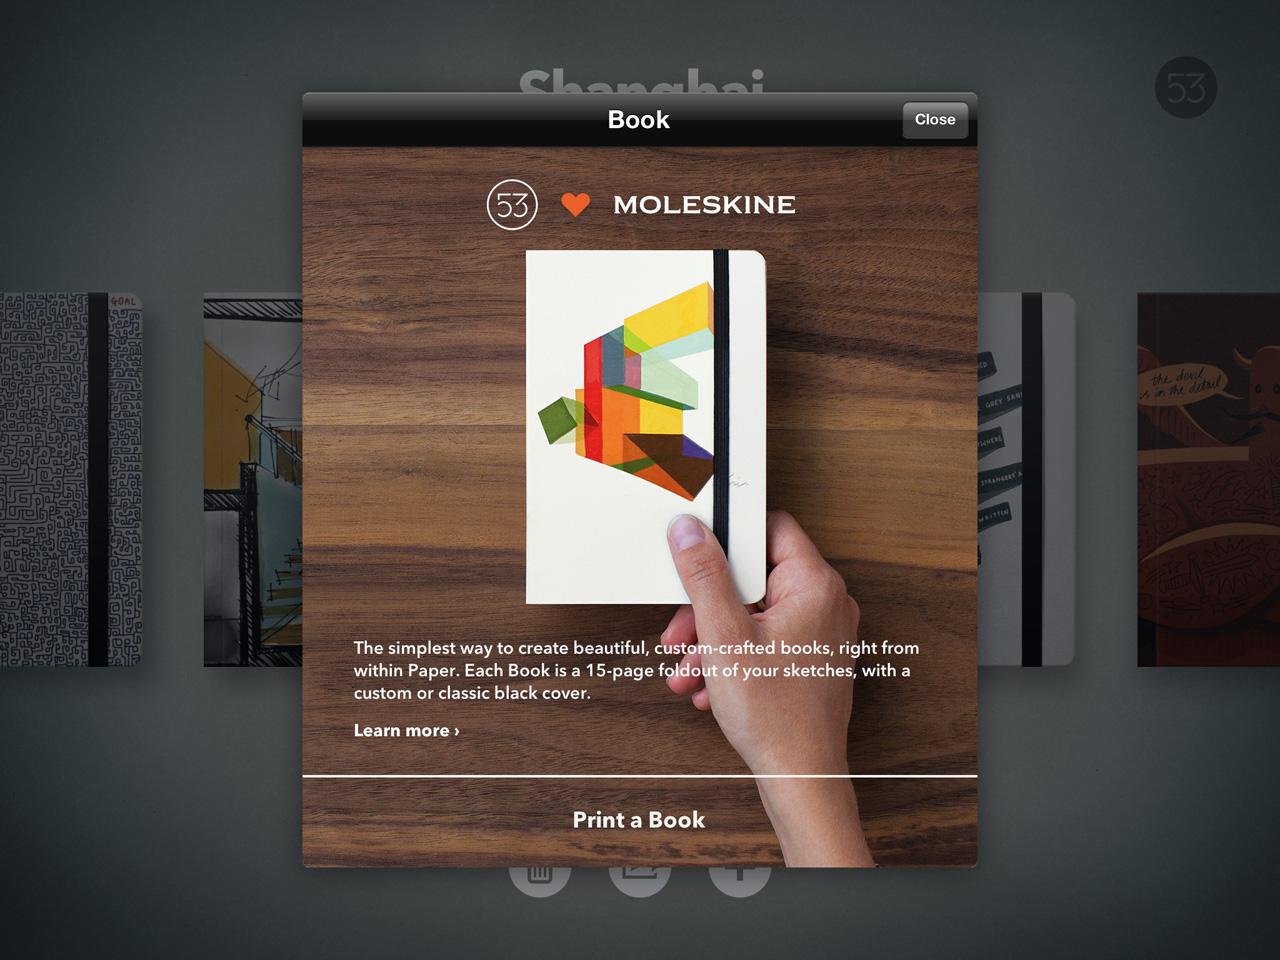 Book-FiftyThree-Moleskin-4-app